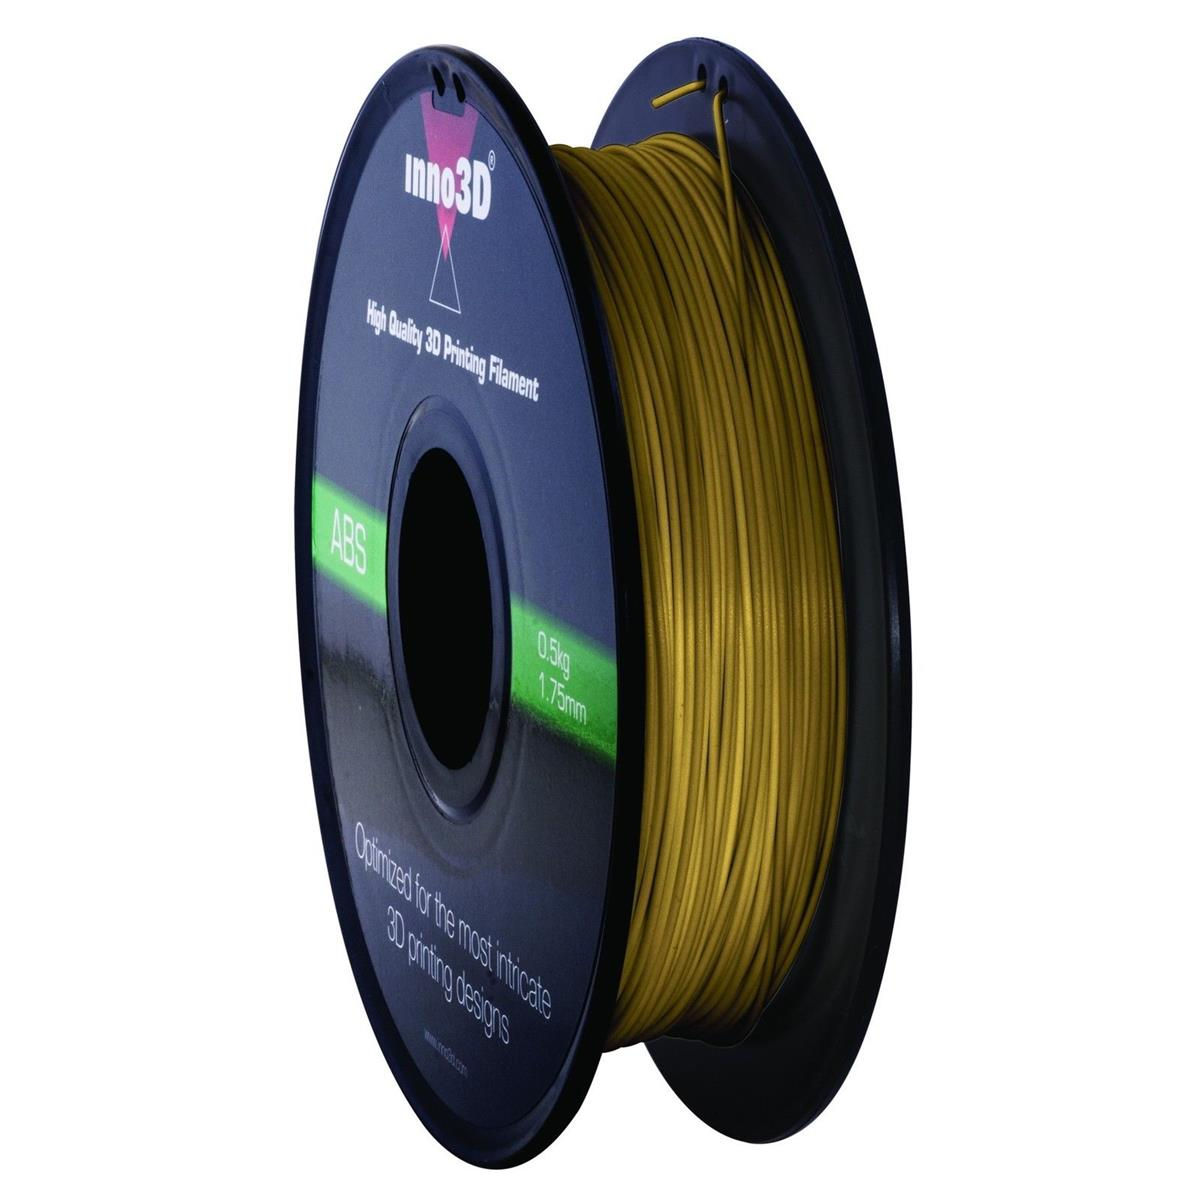 Inno3D ABS Filament for 3D Printer 1.75x200mm 0.5kg Gold Ref 3DPFA175GD05